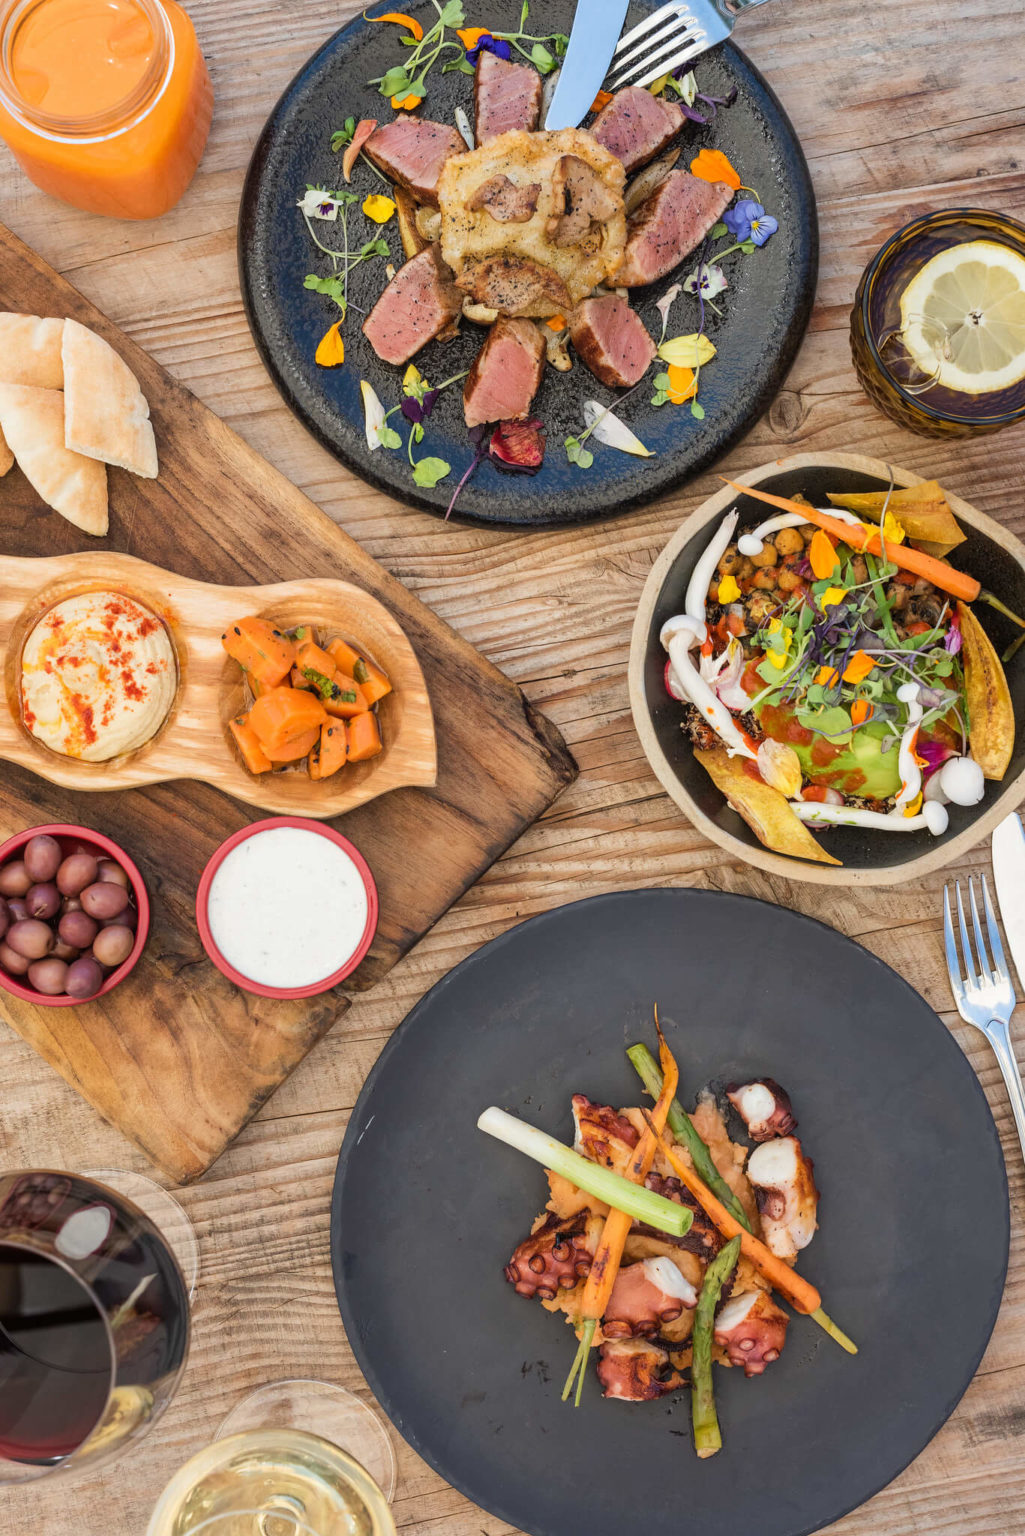 https://www.white-ibiza.com/wp-content/uploads/2020/03/white-ibiza-restaurants-es-cucons-00-1025x1536.jpg